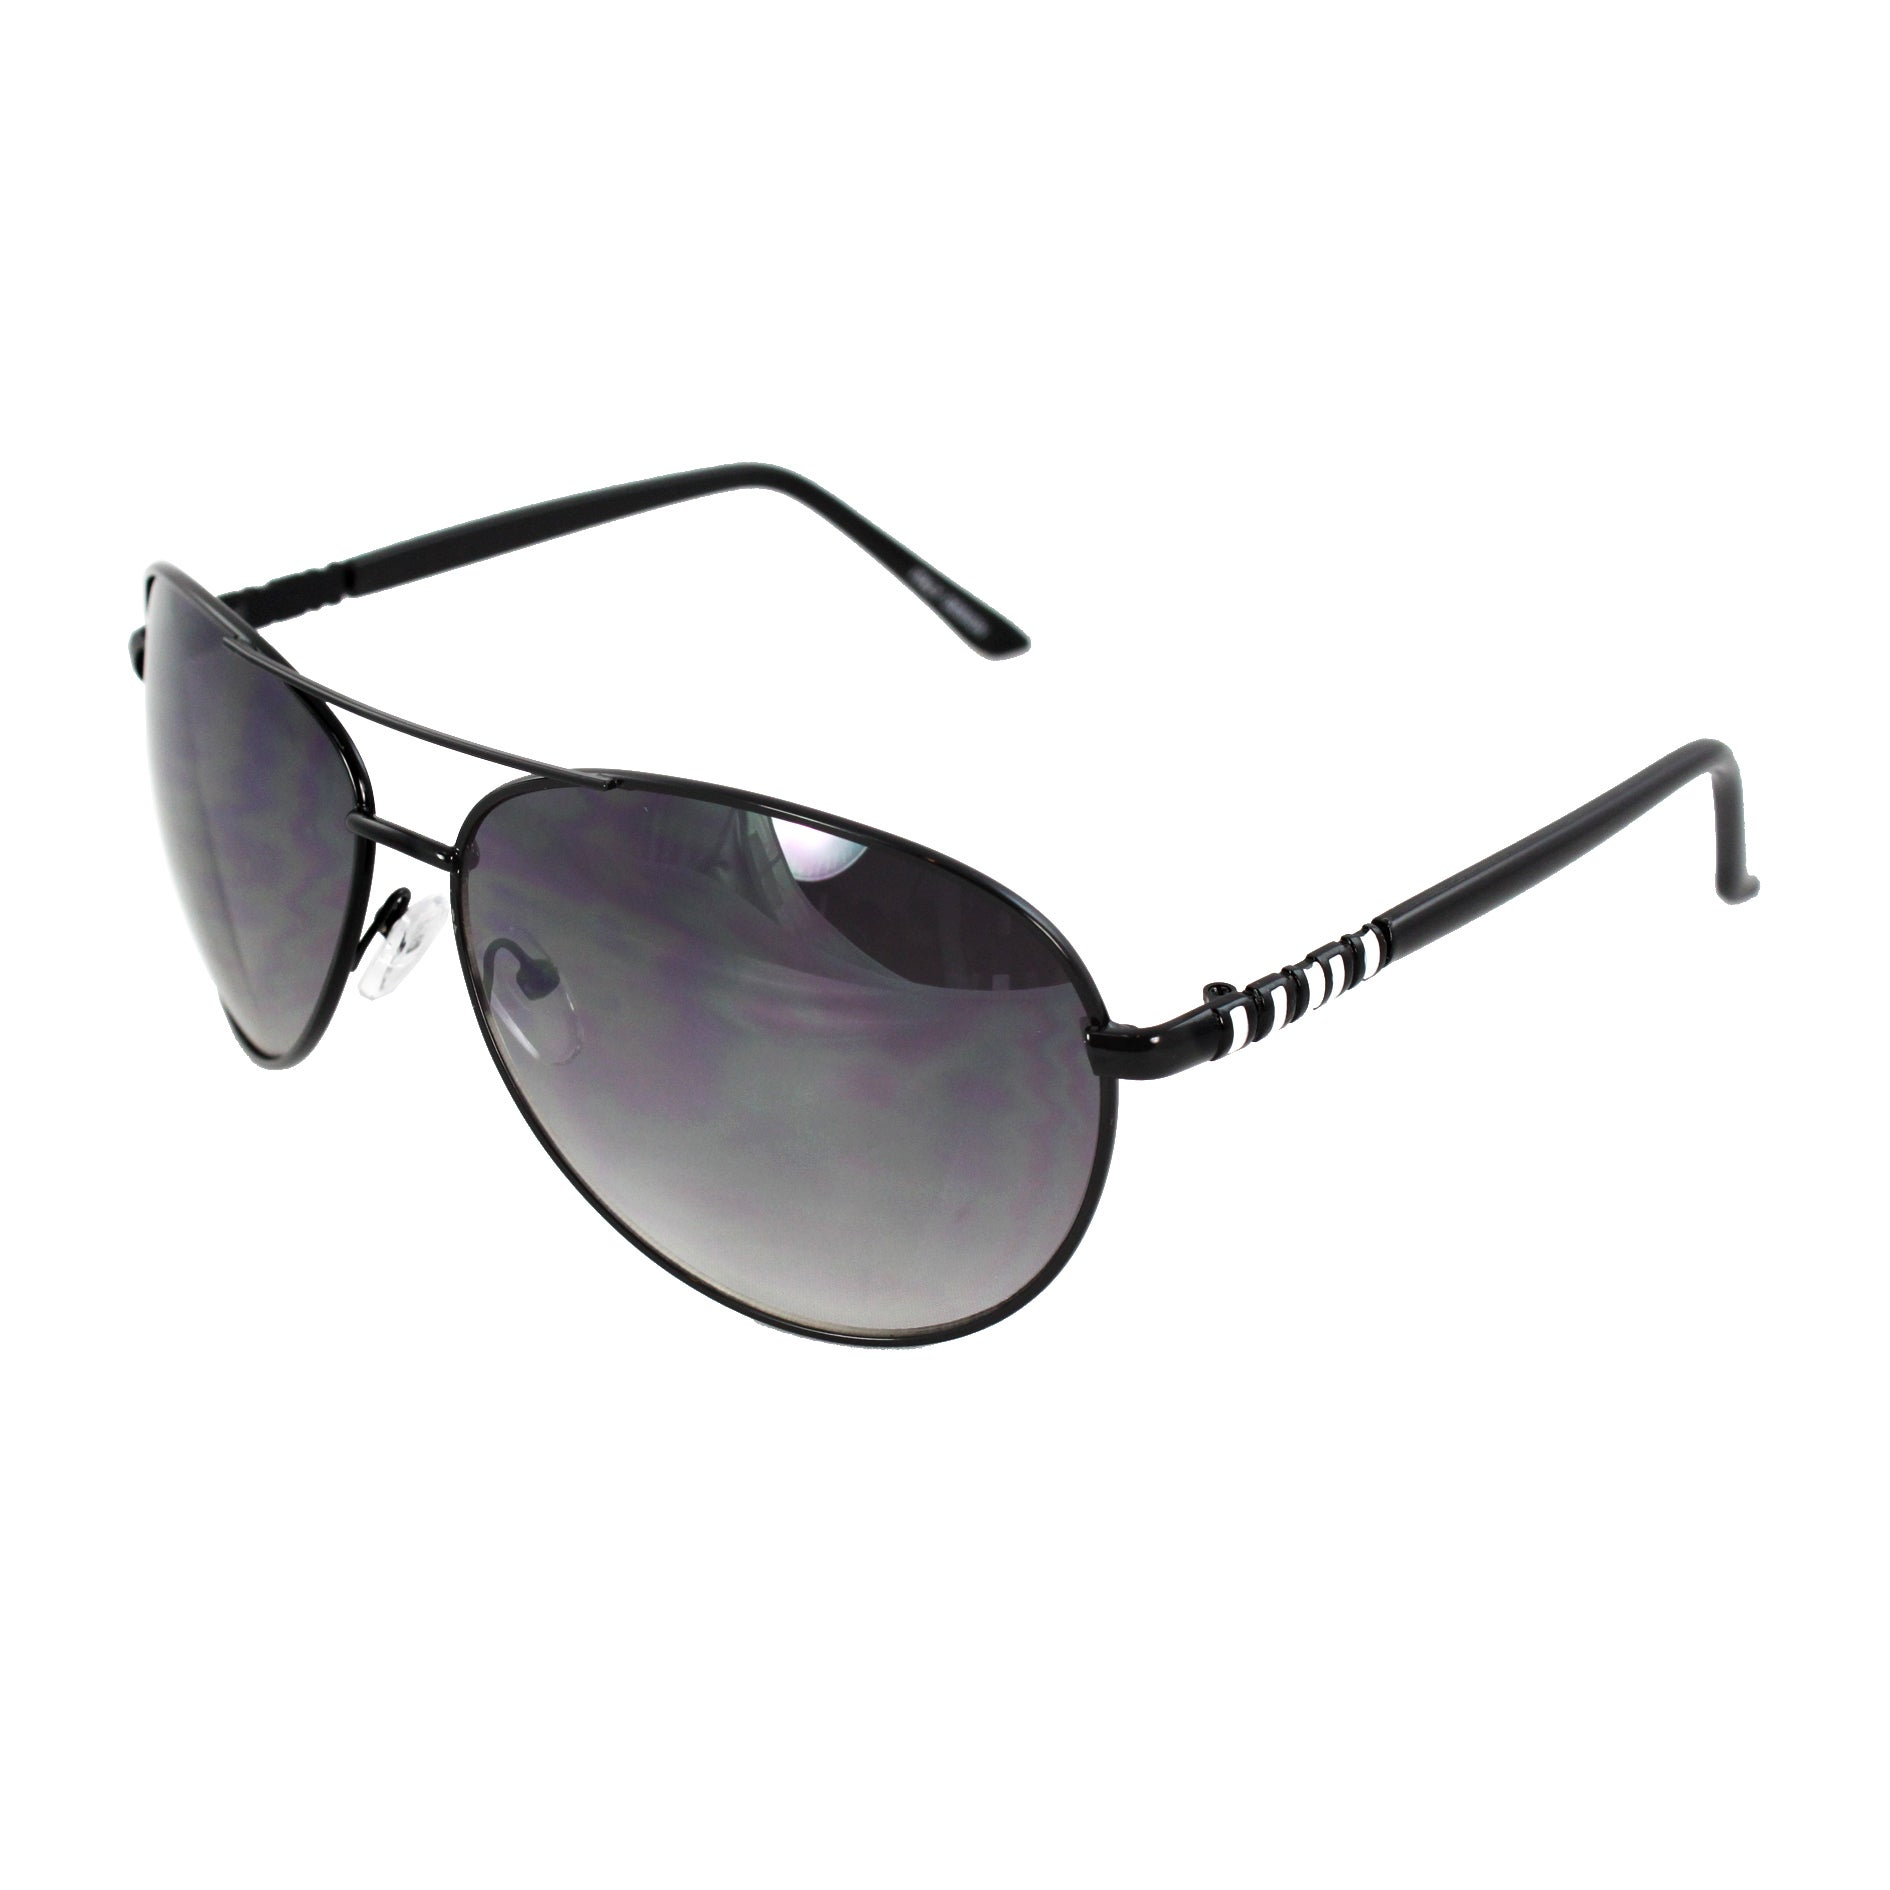 Pilot Fashion Aviator Sunglasses Black Frame with Purple Black Lenses for Men and Women